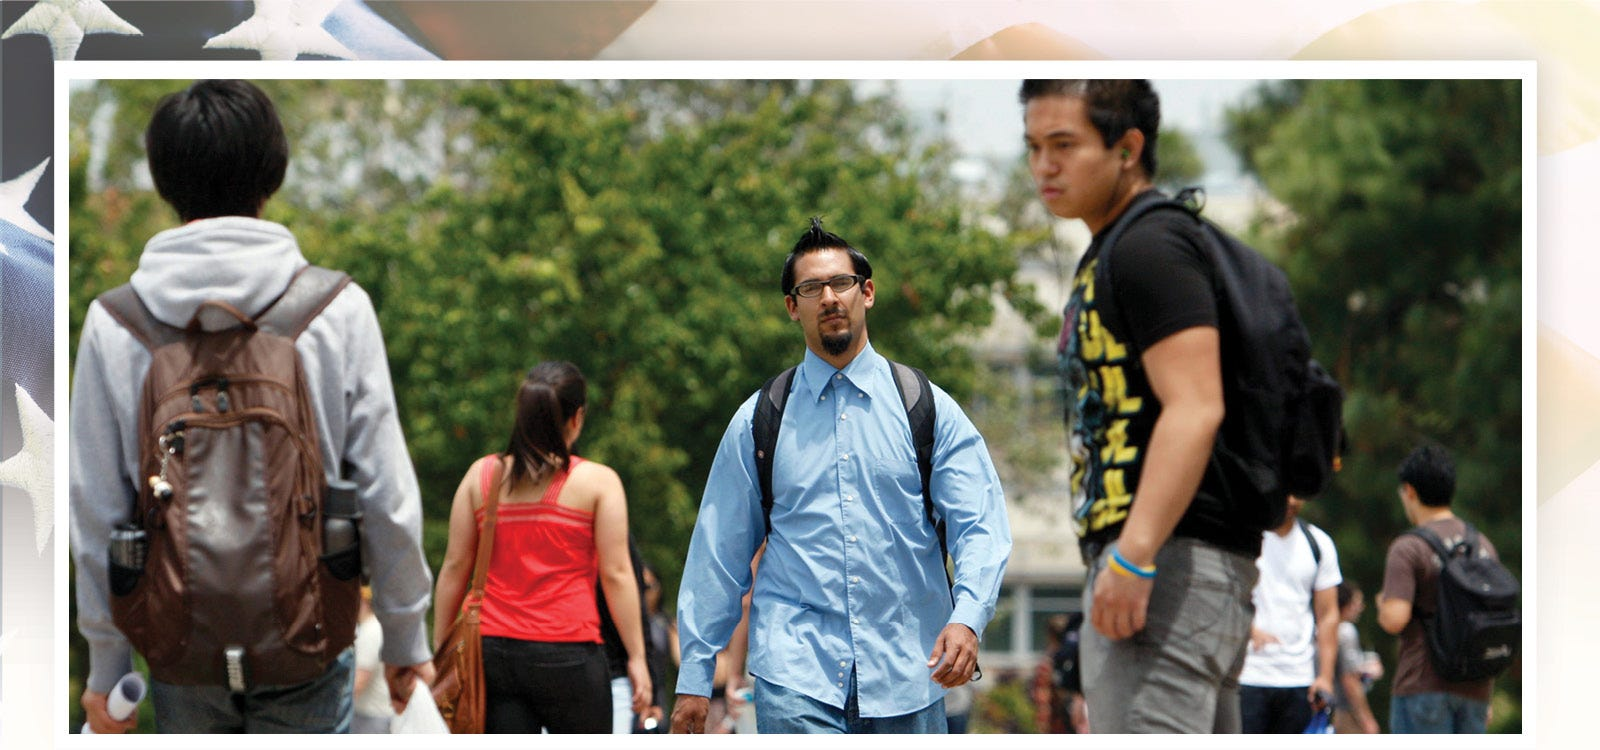 Roberto Rodriguez walks on the University of California-Riverside  campus In June of 2010 in Riverside, California.